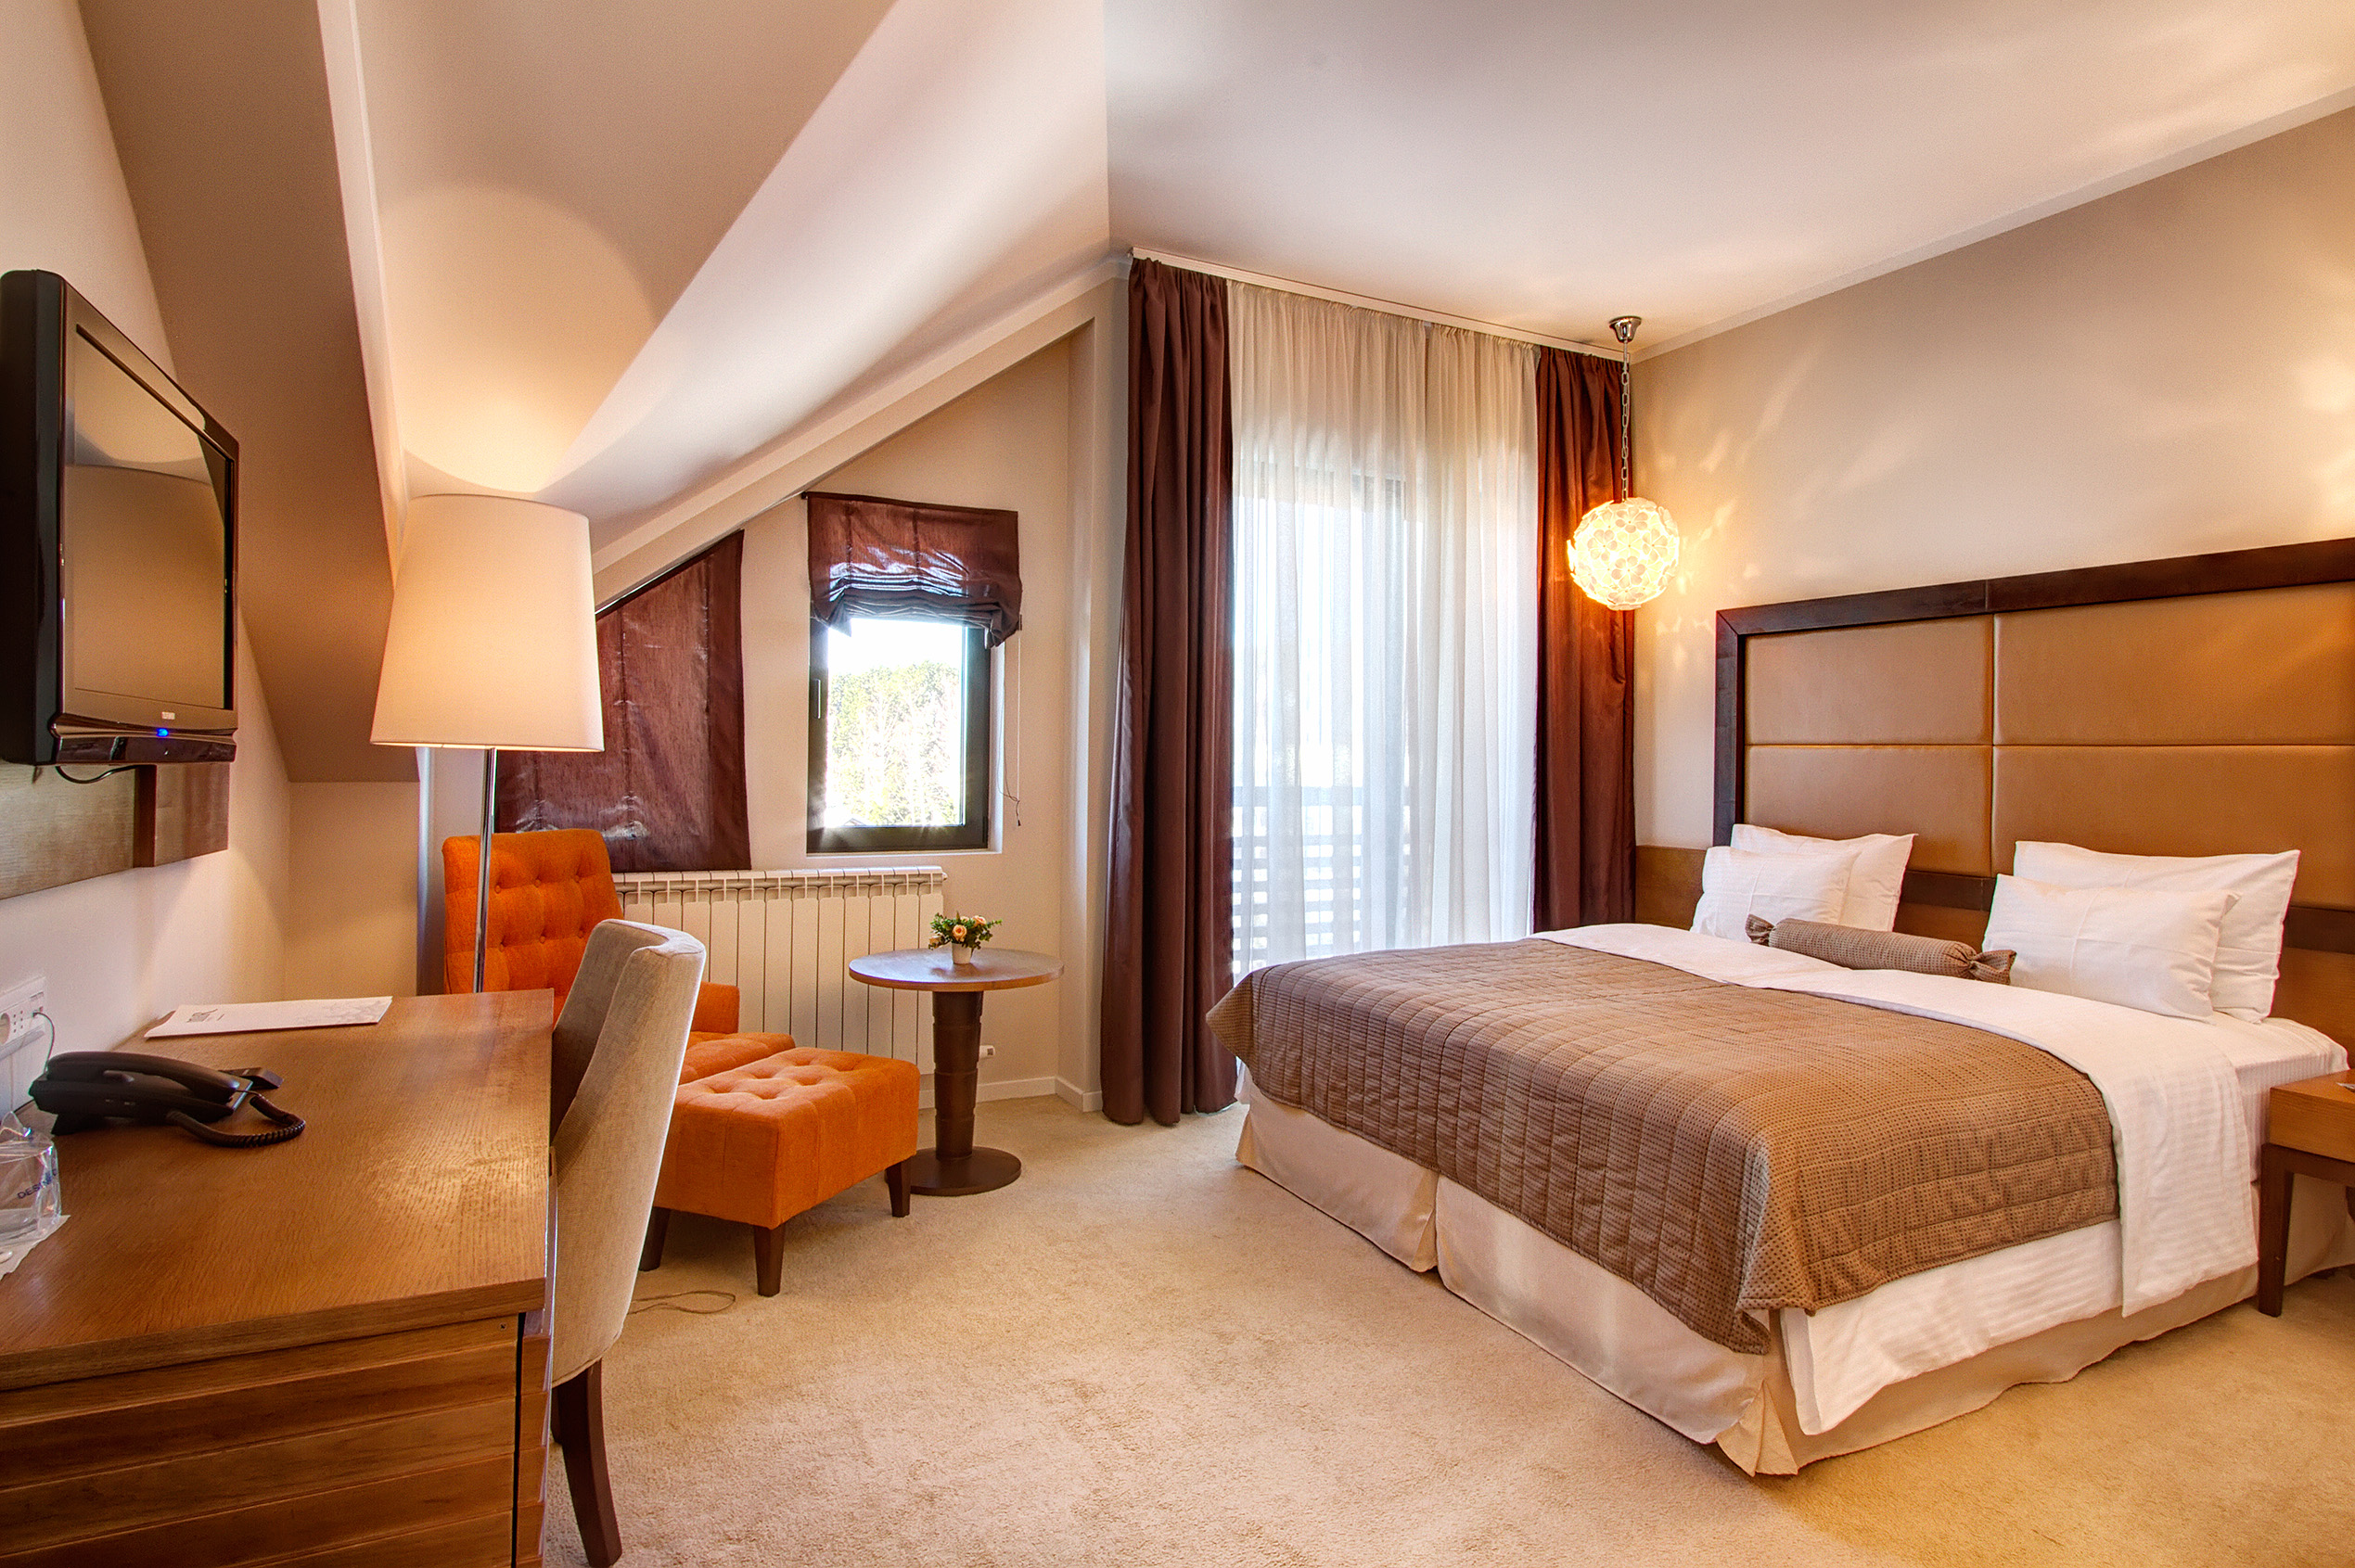 Zlatibor, smestaj, letnji odmor, spavanje, pansion, spa, soba, apartman, akcija, nova godina, hotel mir 39